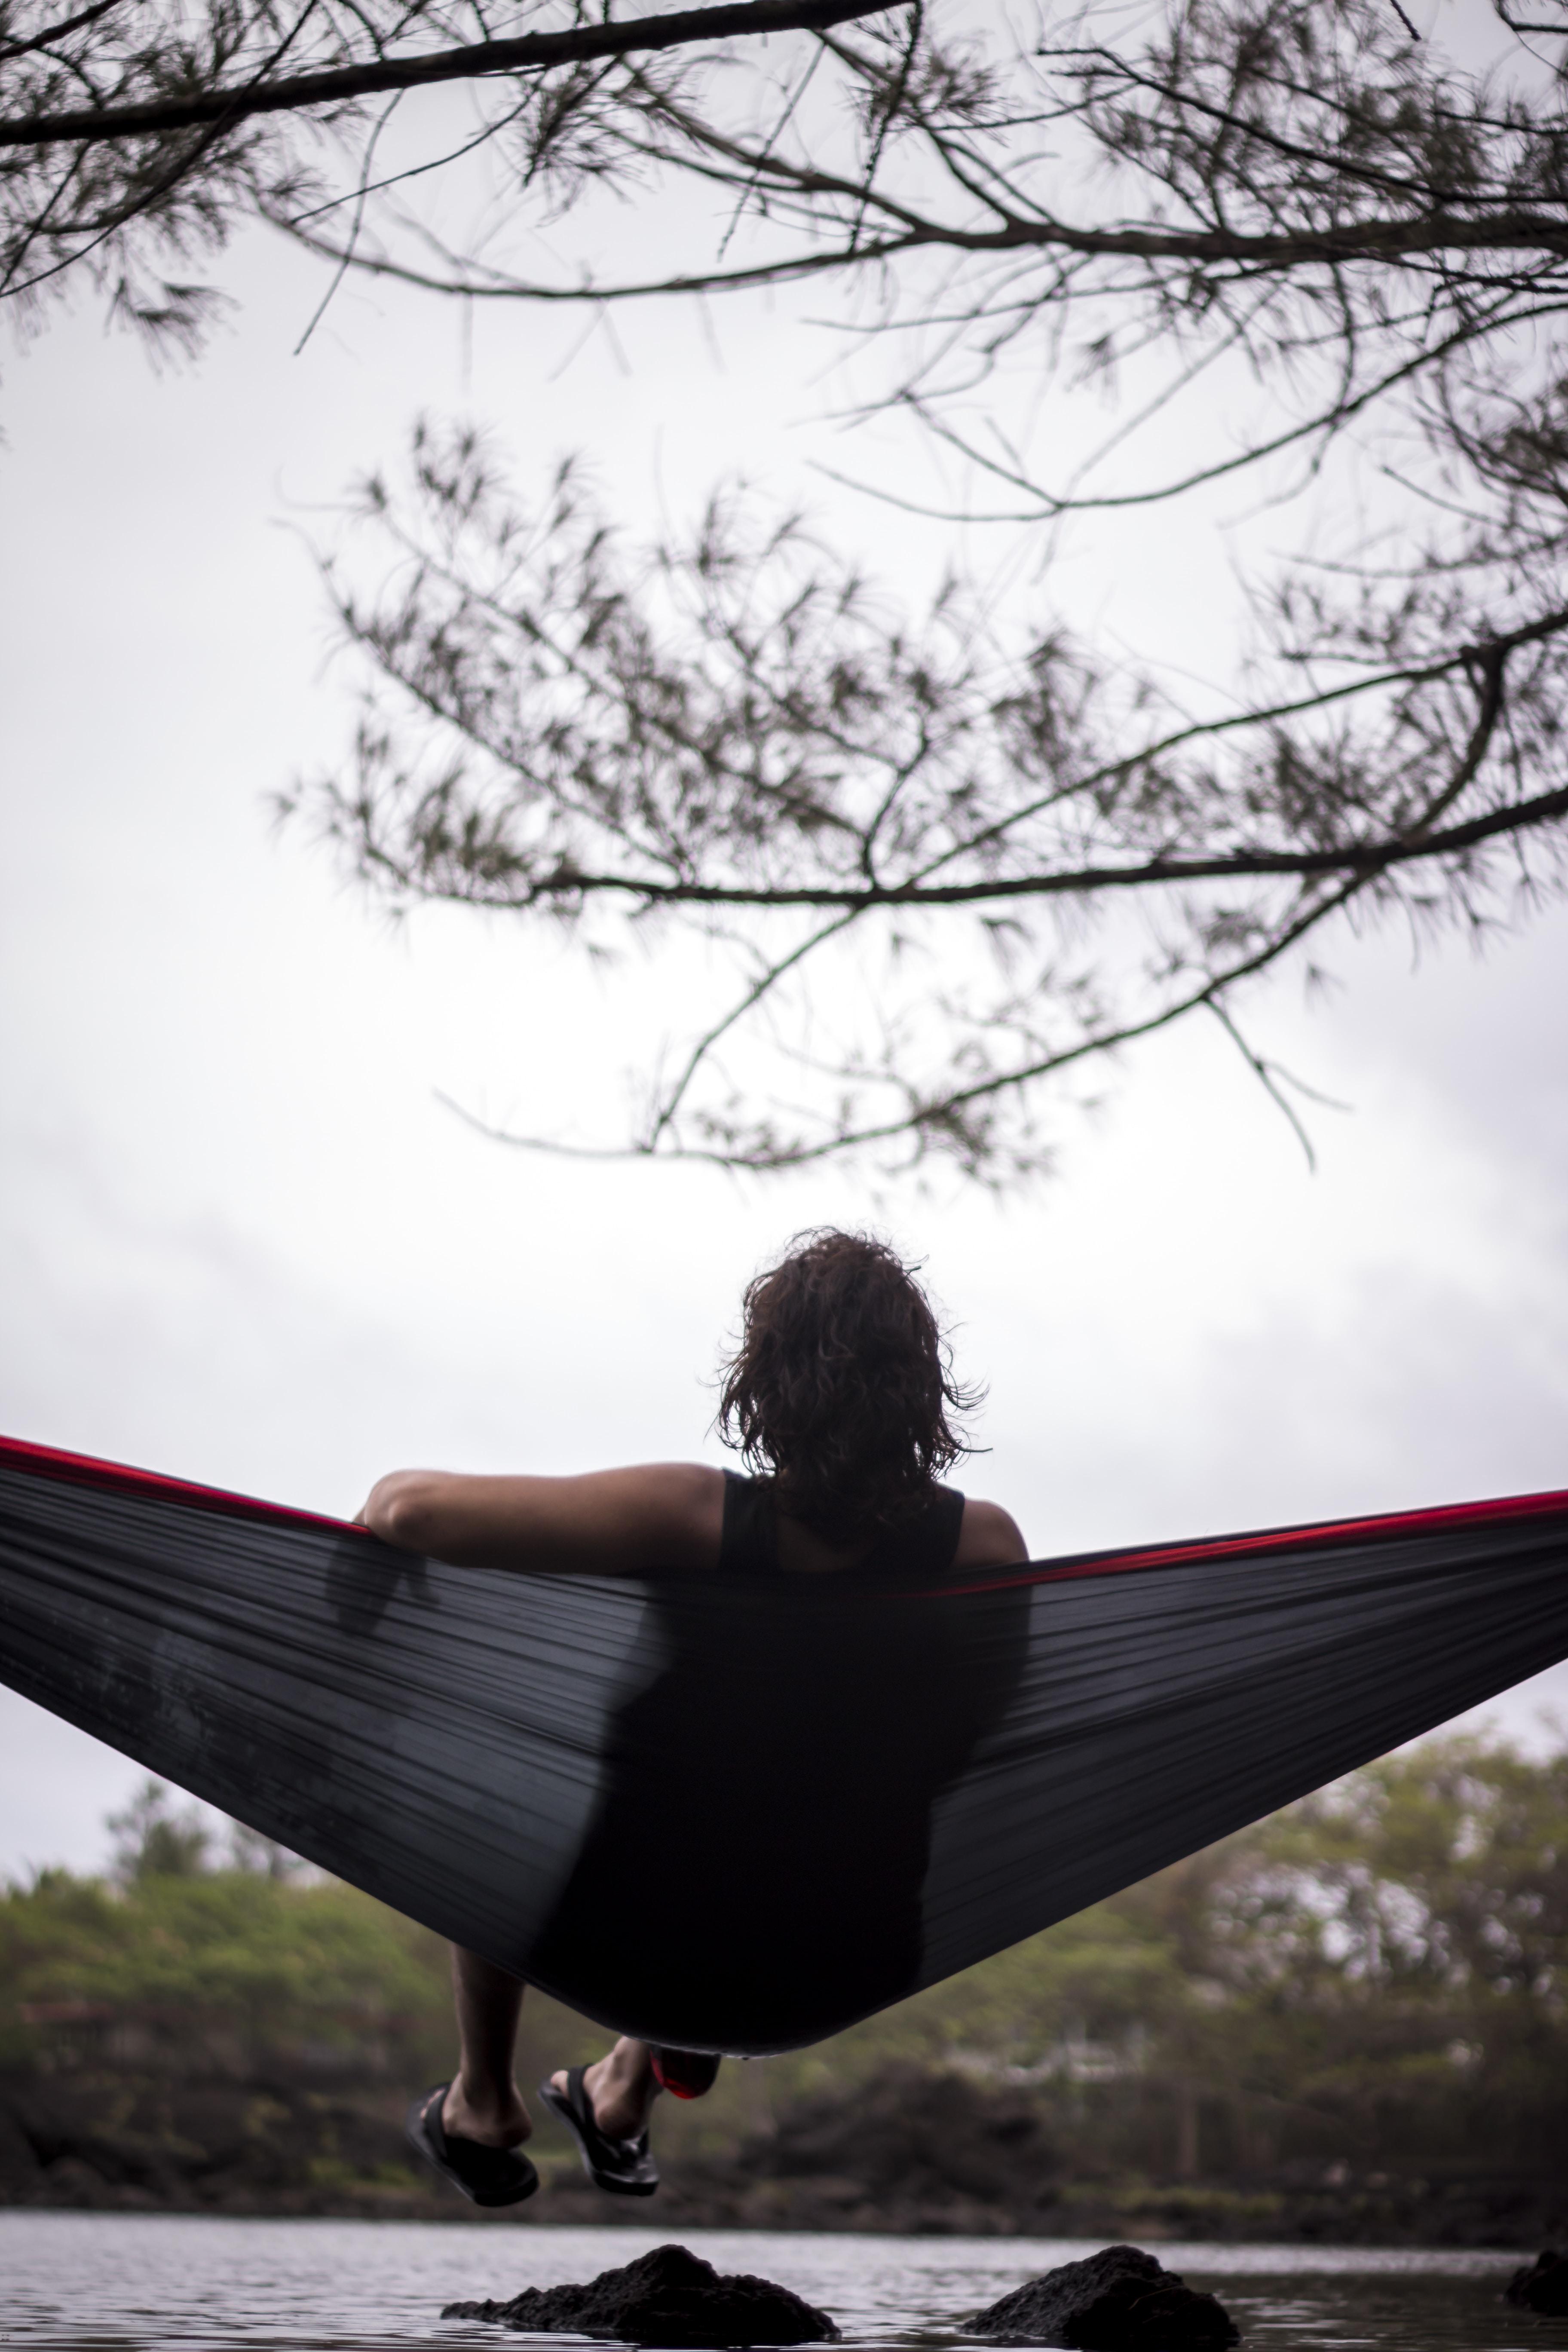 woman sitting on hammock facing body of water